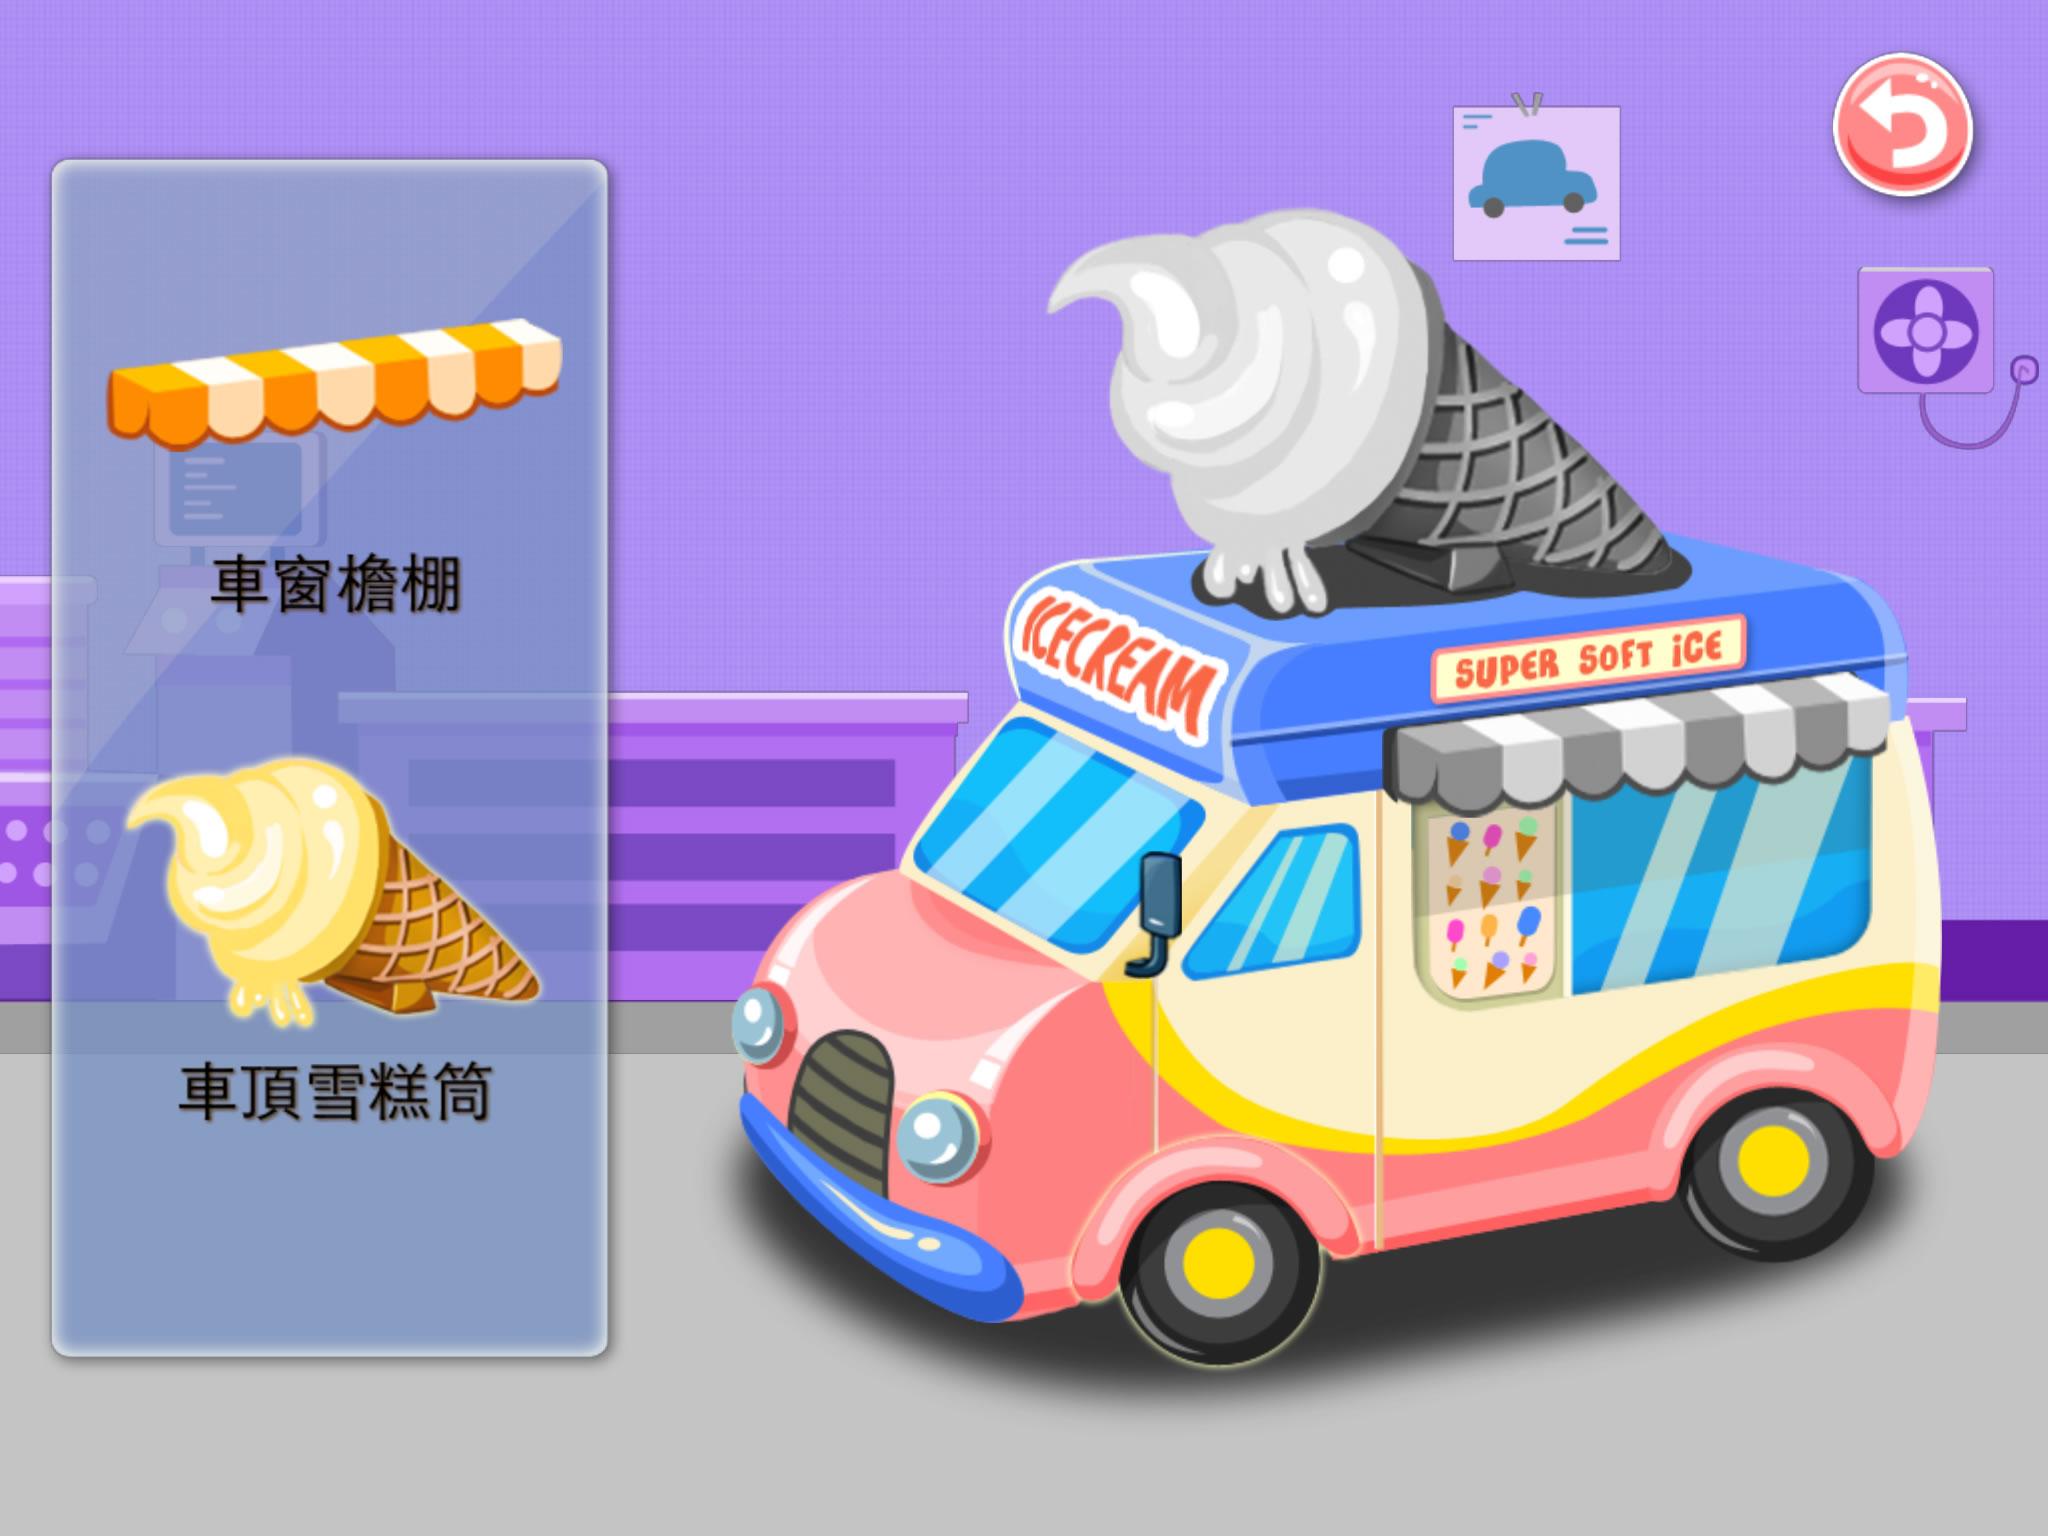 Ice Cream Truck (Mandarin Chinese Pronunciation) - 雪糕车 - 宝宝认知拼图系列游戏